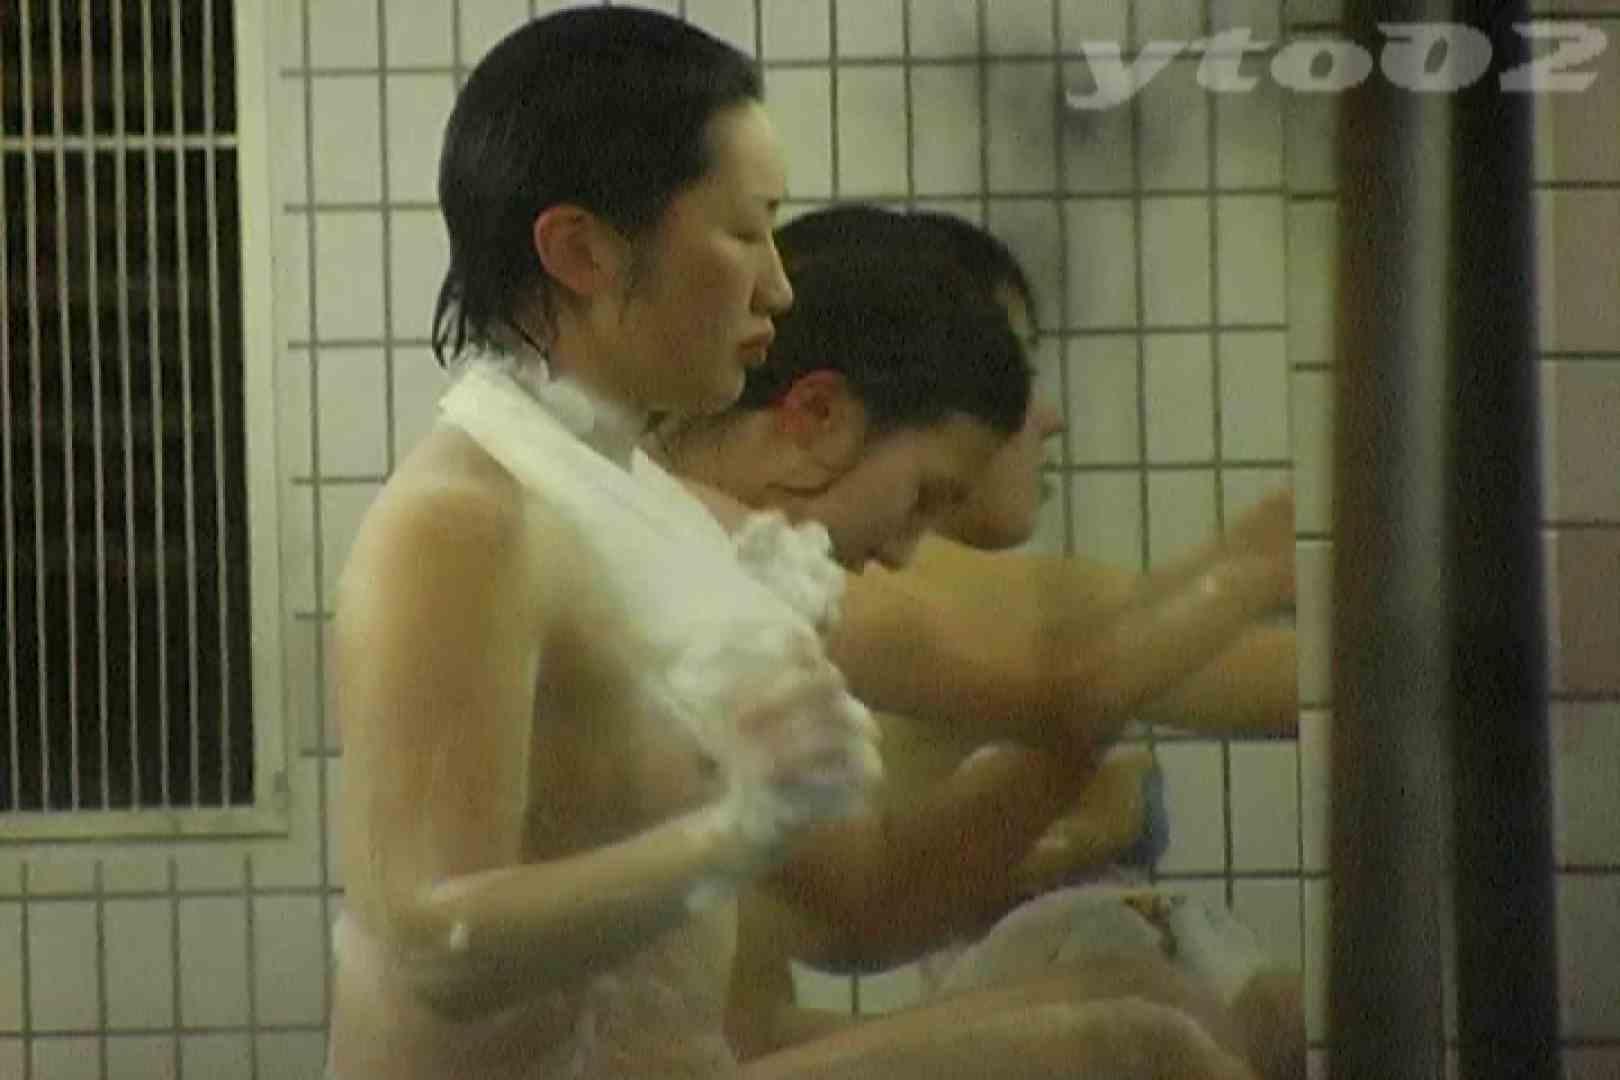 ▲復活限定▲合宿ホテル女風呂盗撮 Vol.11 入浴  79pic 17